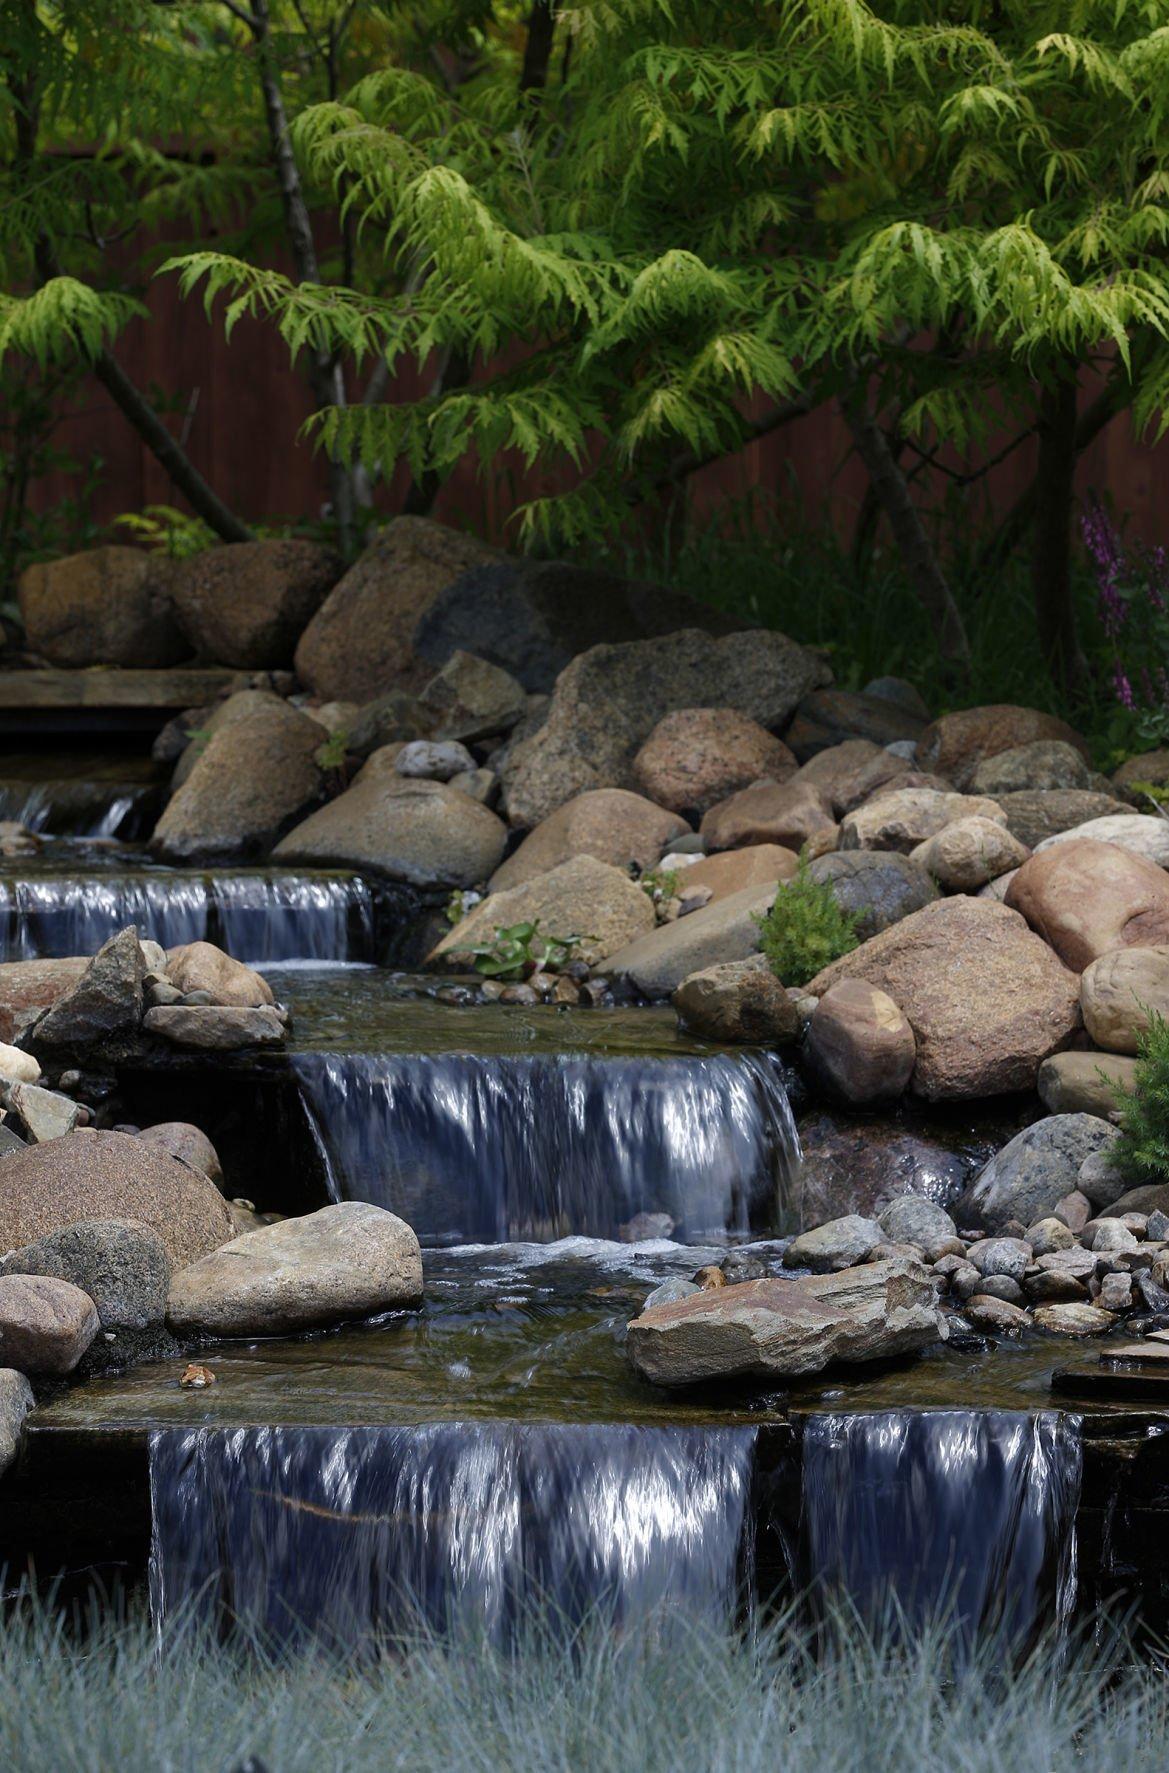 070519bp-pond-tour-cv-arboretum-01